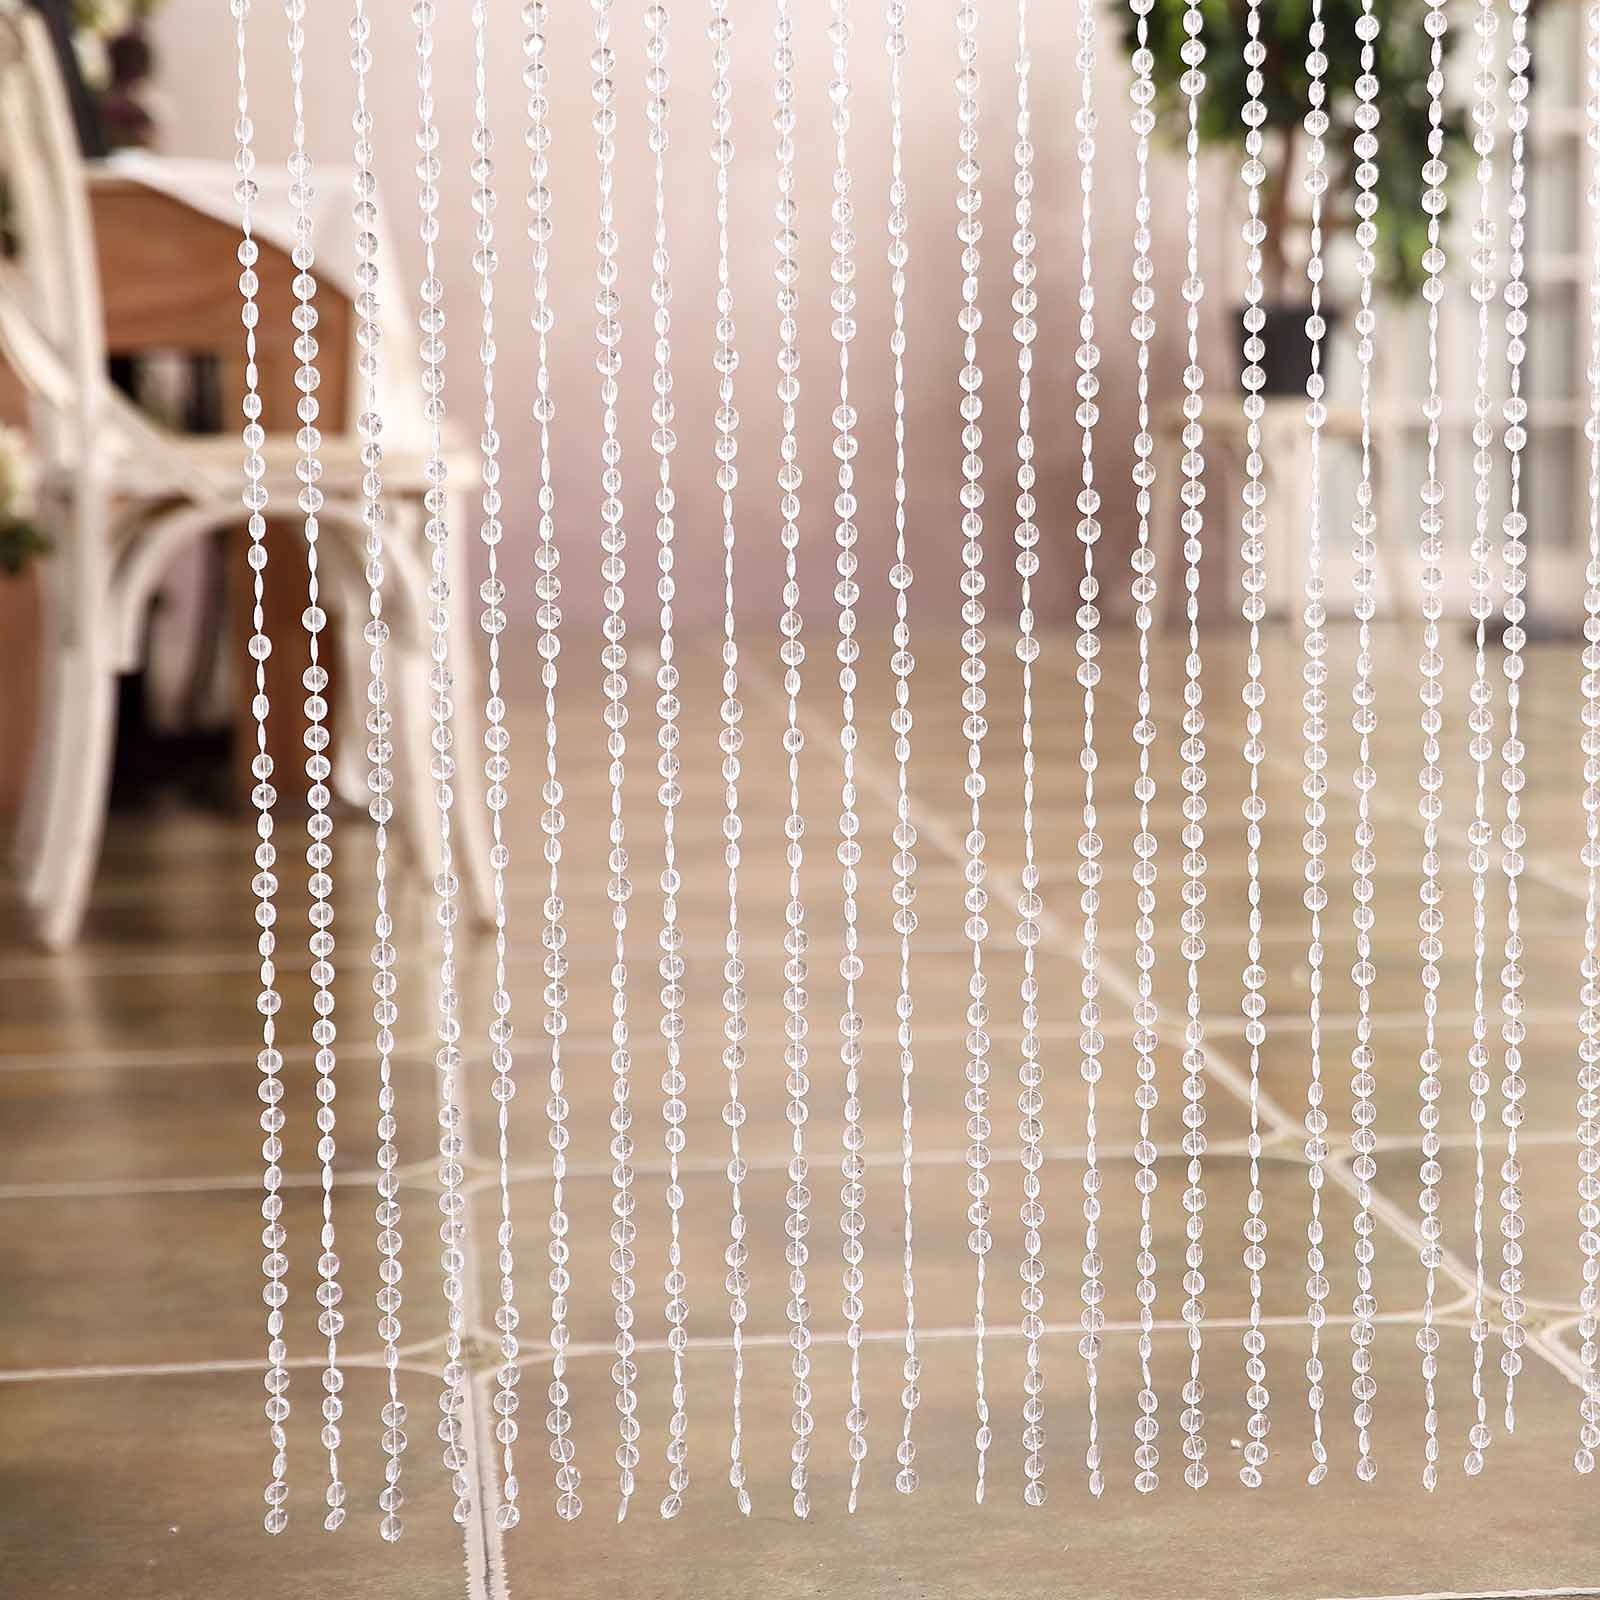 Efavormart PRINCESS-Style Endless Diamond Curtain Backdrops 8ft x 3ft Clear Diamonds w/ Bendable Rod Top